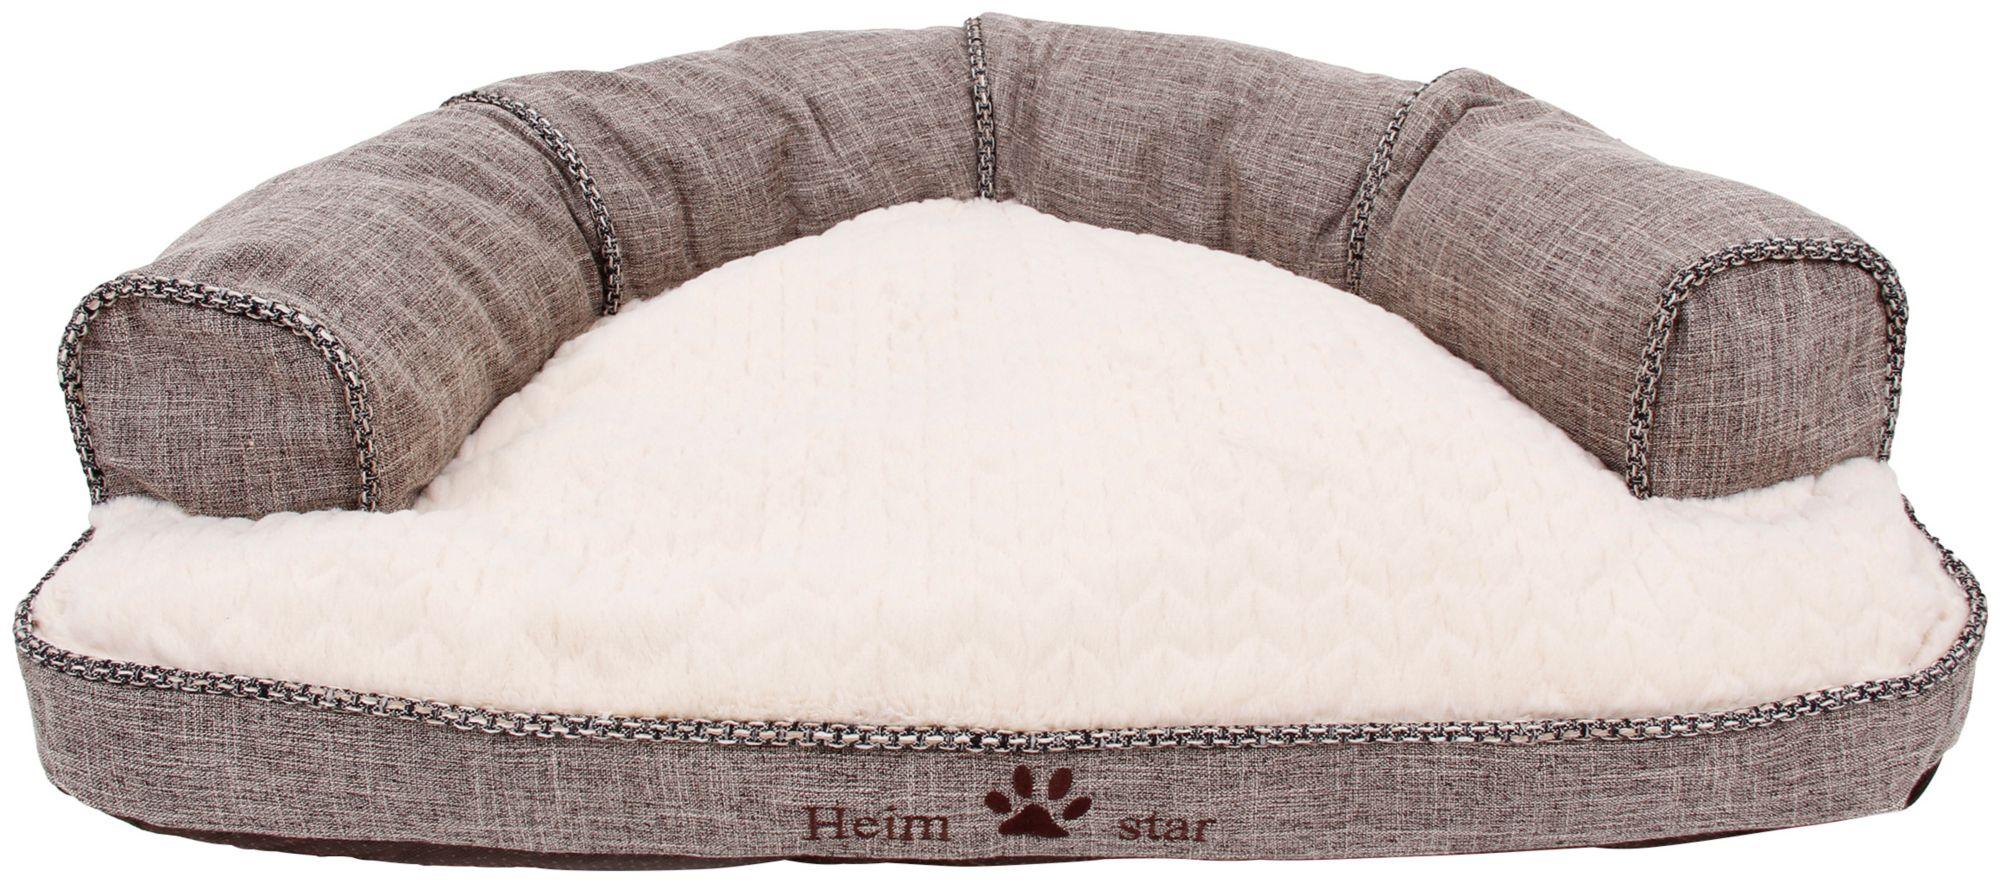 HEIM  Hundesofa und Katzensofa »Heimstar«, BxL: 58x75 cm, hellbraun-weiß